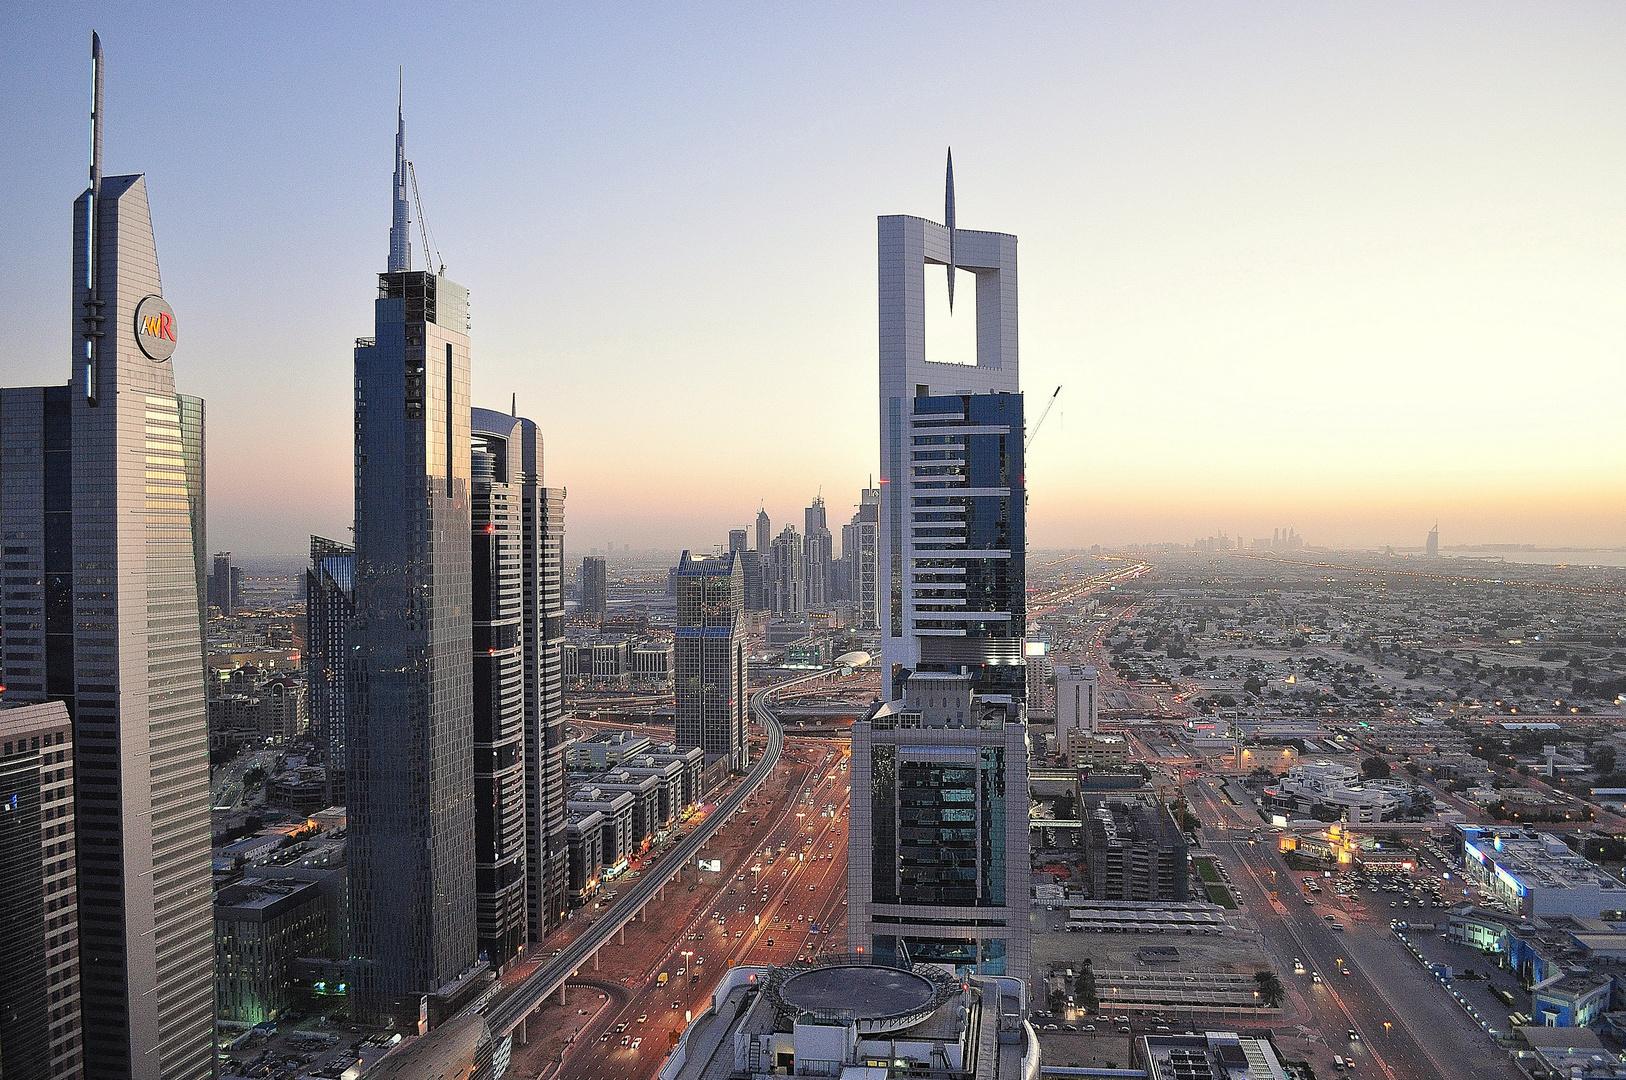 Daemmerung Sheikh Zayed Road